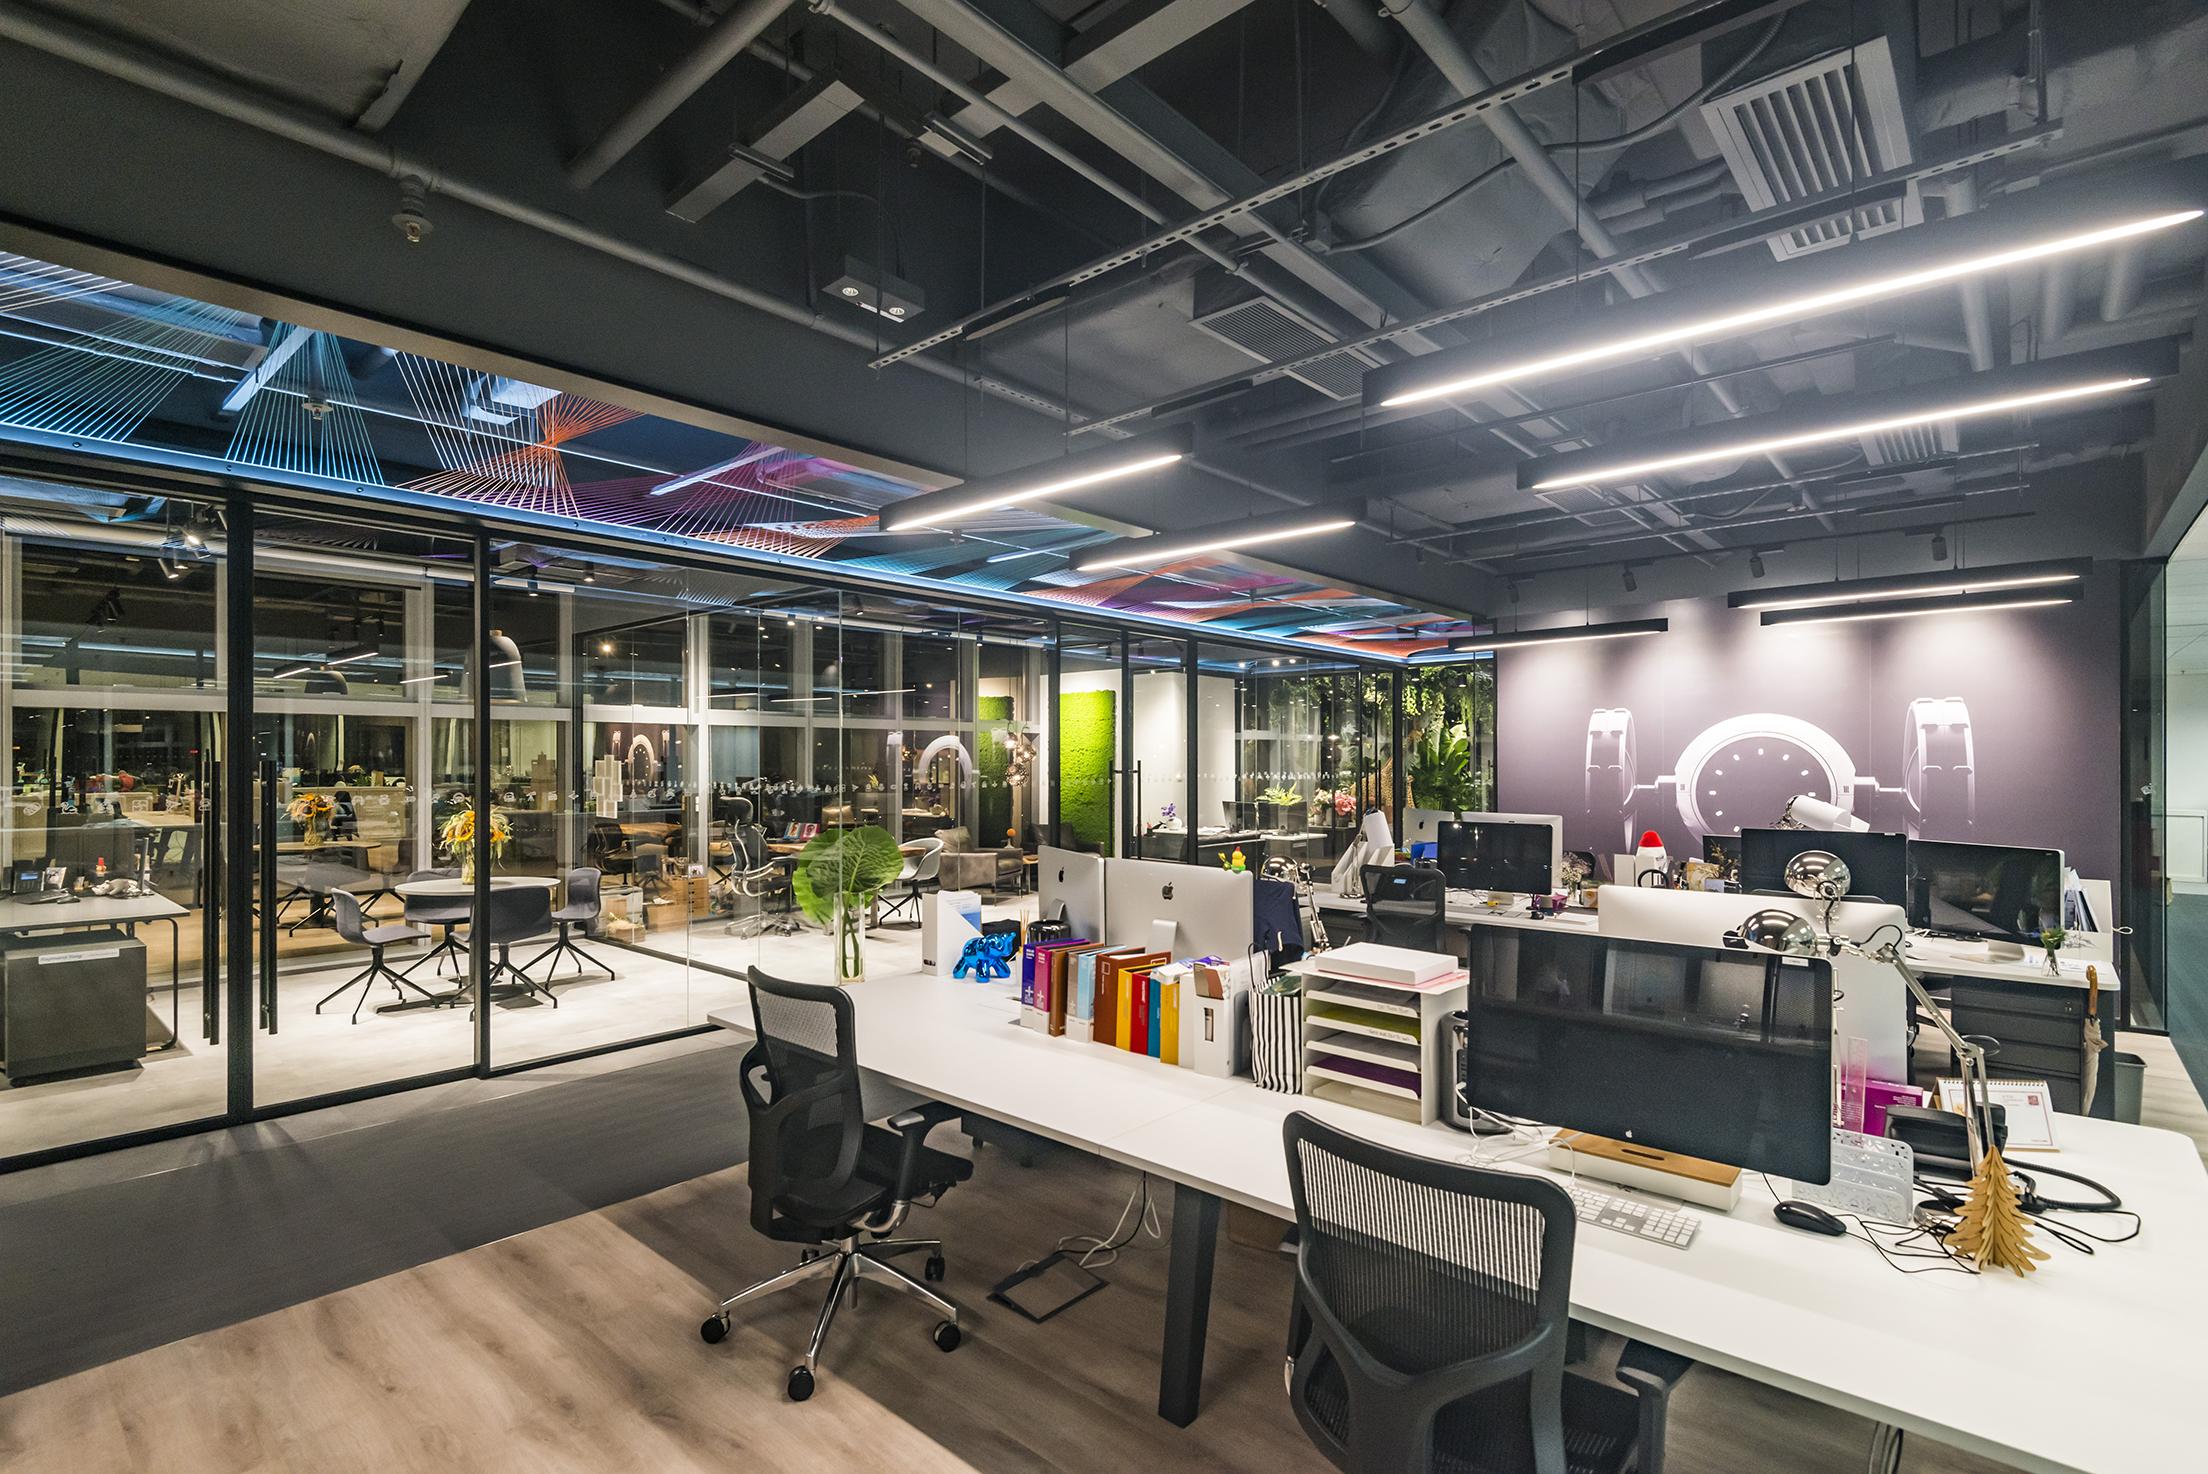 jeb-partitions-summit-threesixty-office-hk-21.jpg